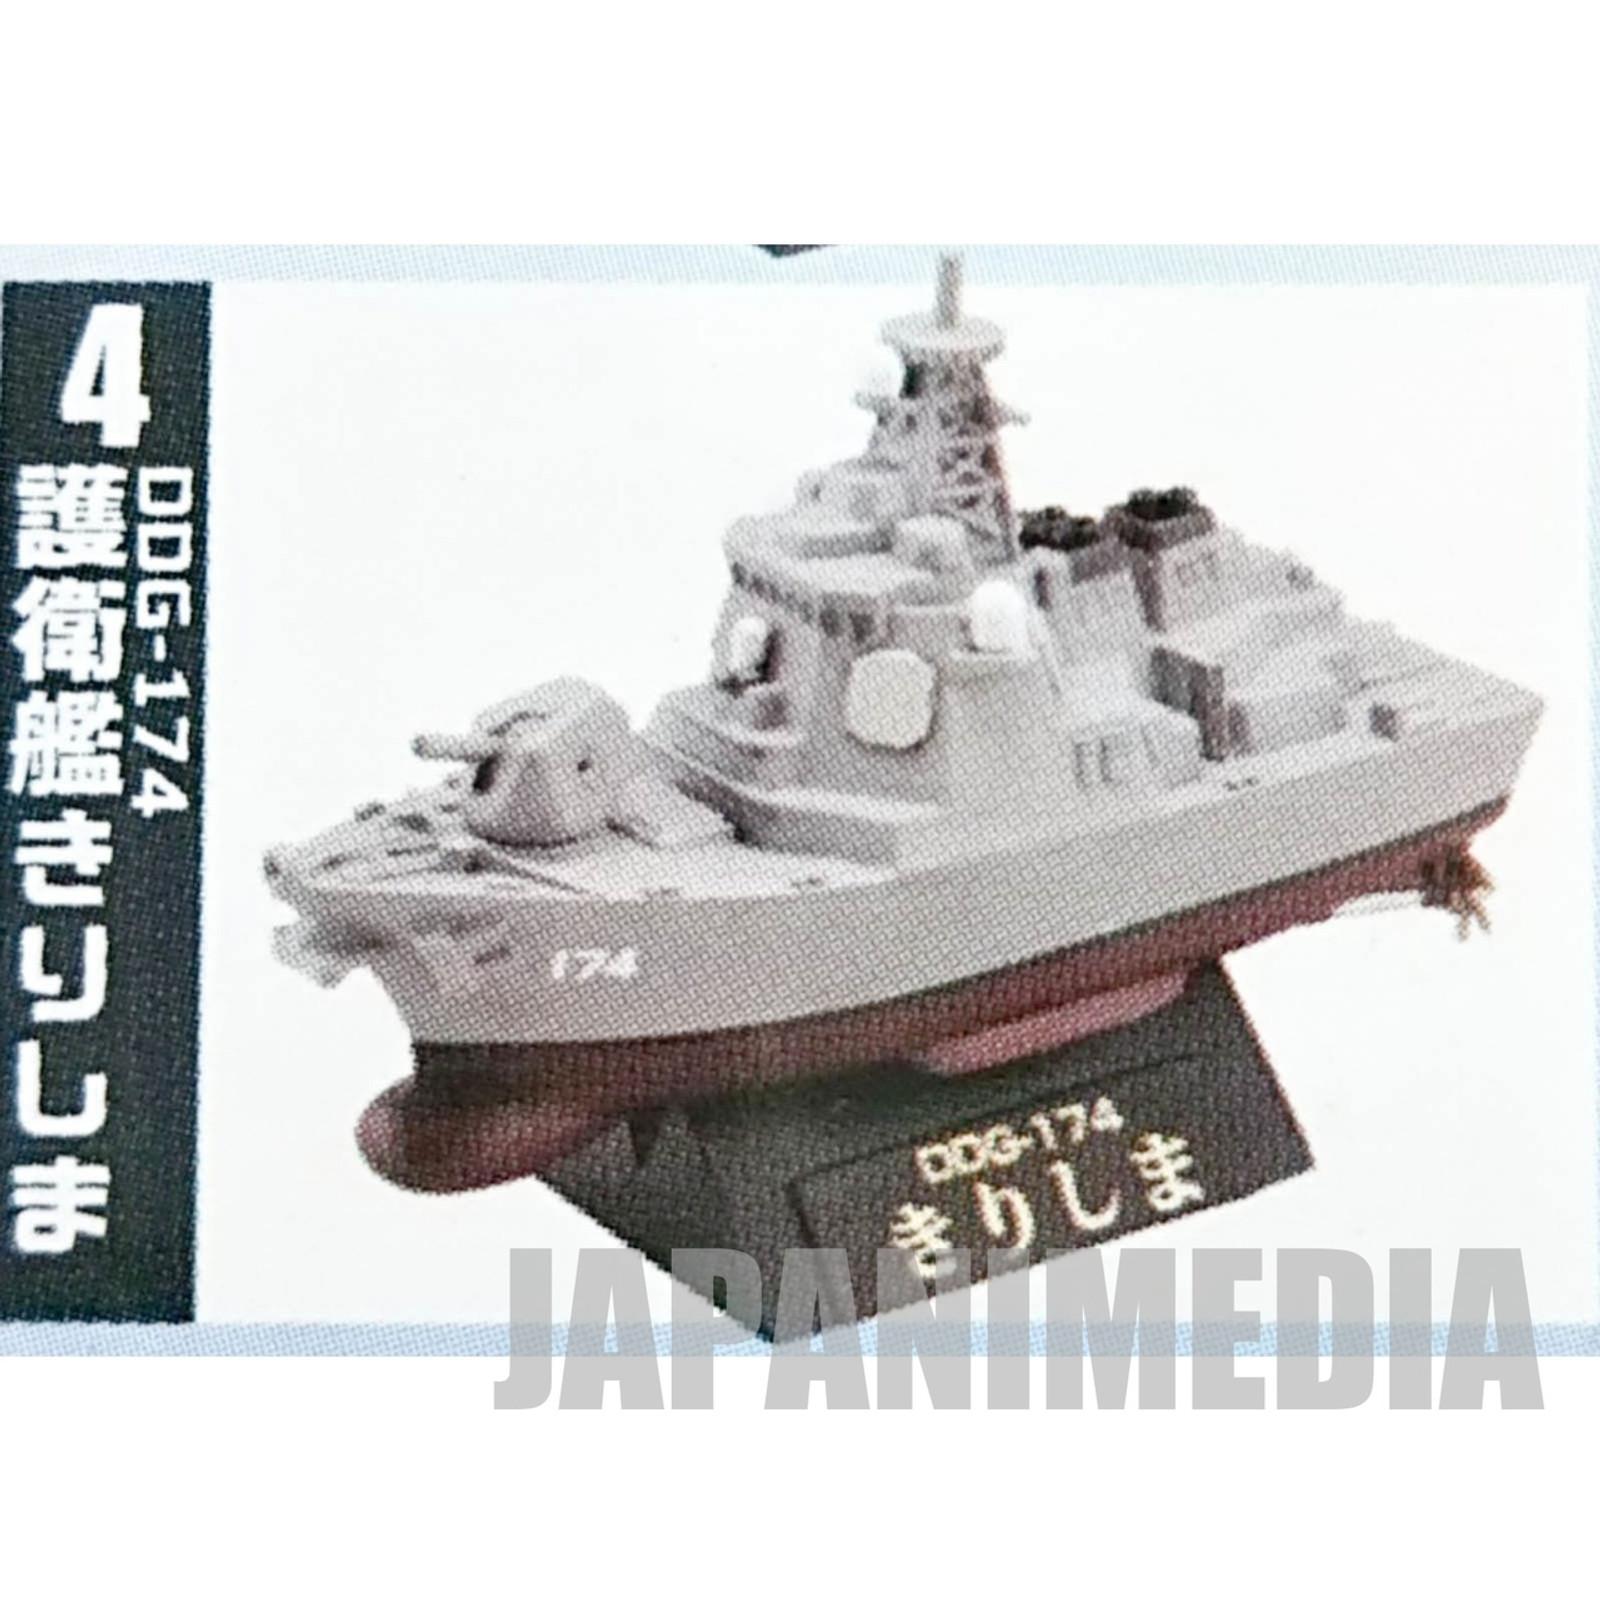 Chibi Scale Escort Ship Kirishima Type DOG-174 Miniature Figure Kaiyodo F-Toys JAPAN